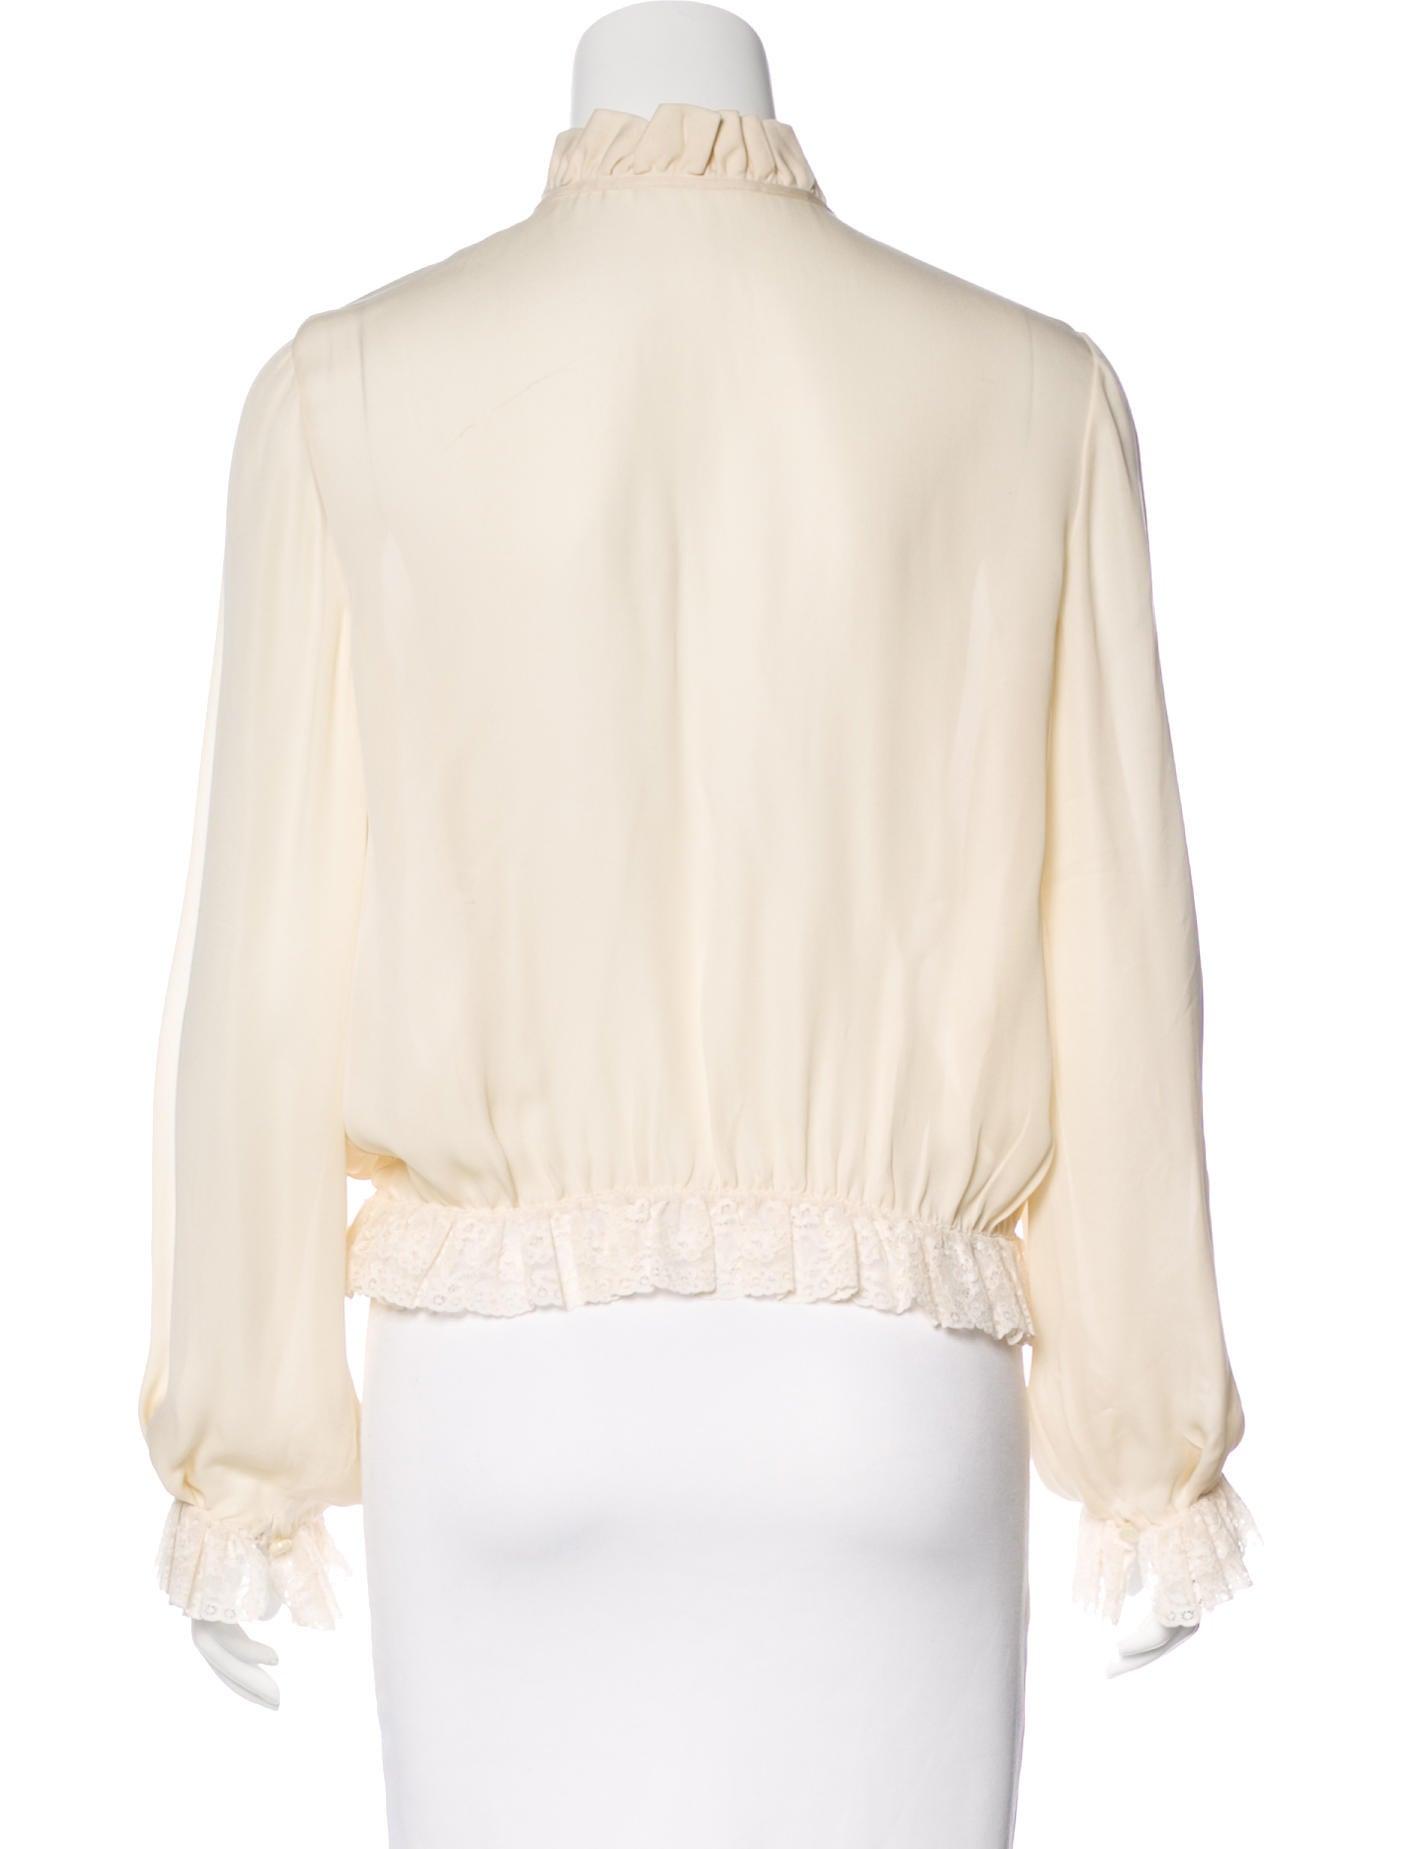 Valentino Vintage Silk Blouse - Clothing